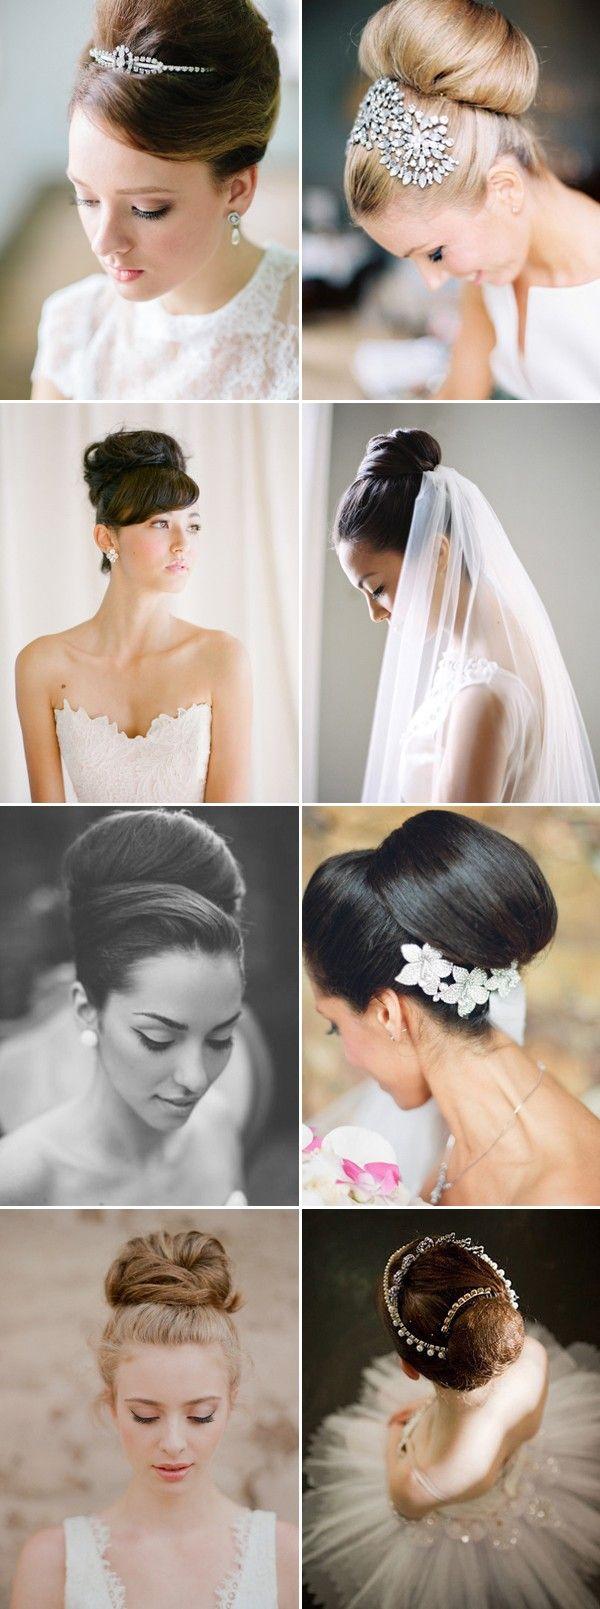 Wedding Hairstyles Audrey Hepburn Style Classic Bun Wedding Updos